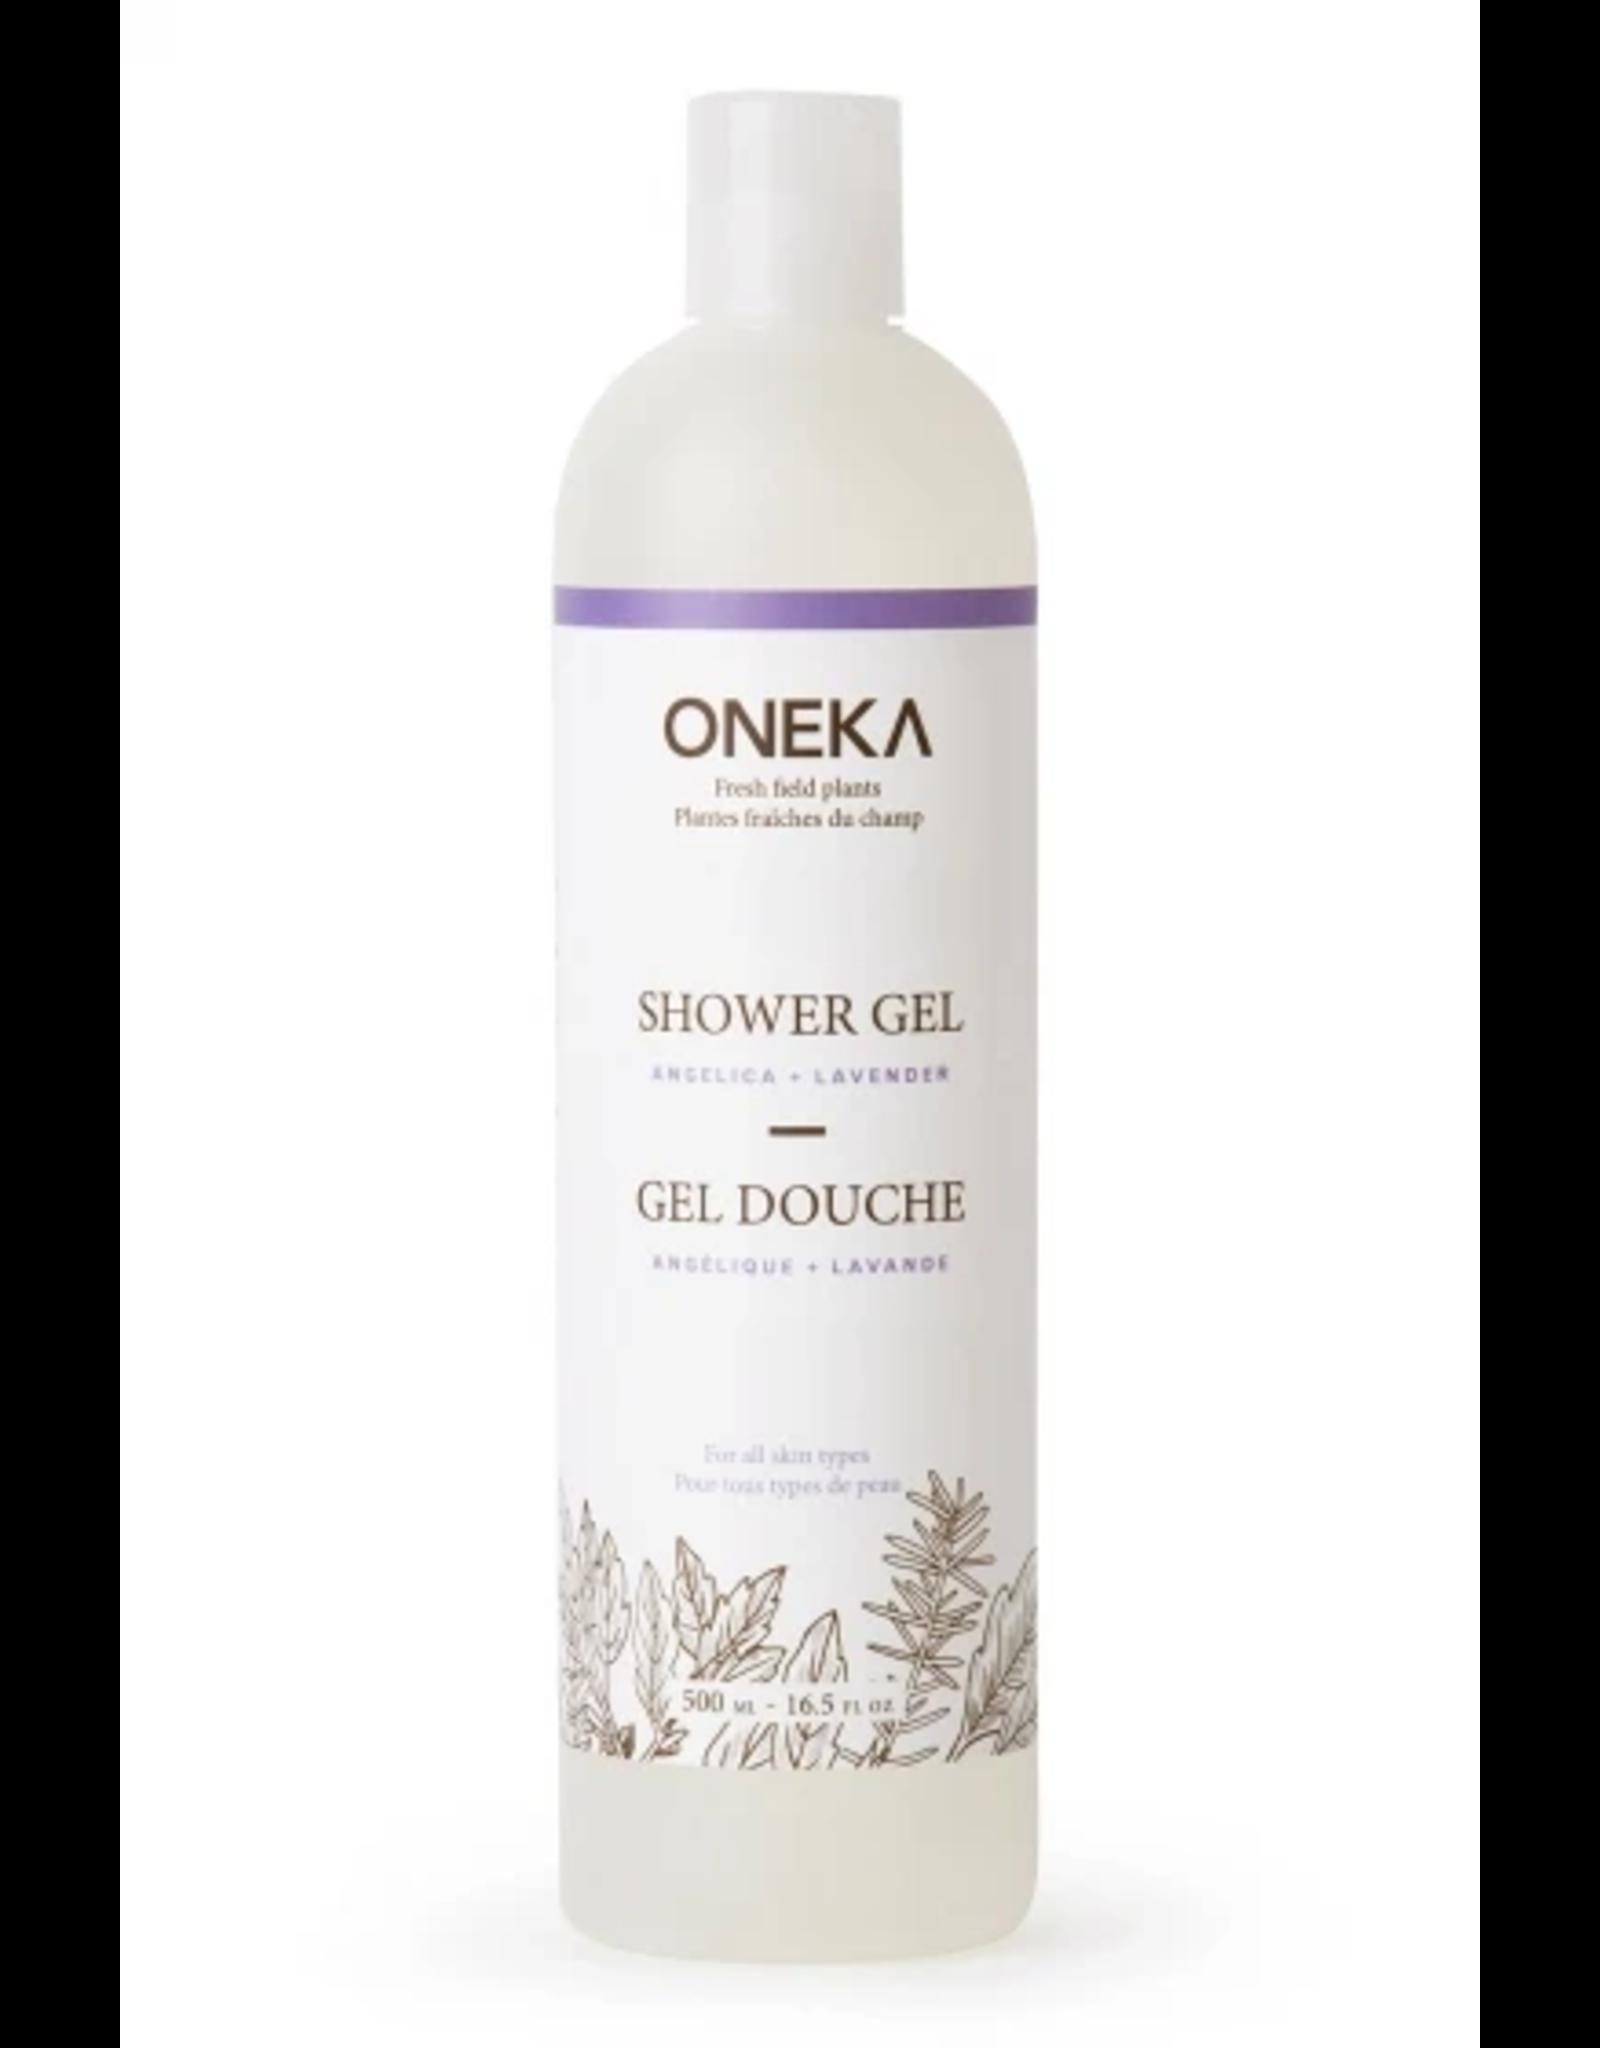 Oneka Shower Gel